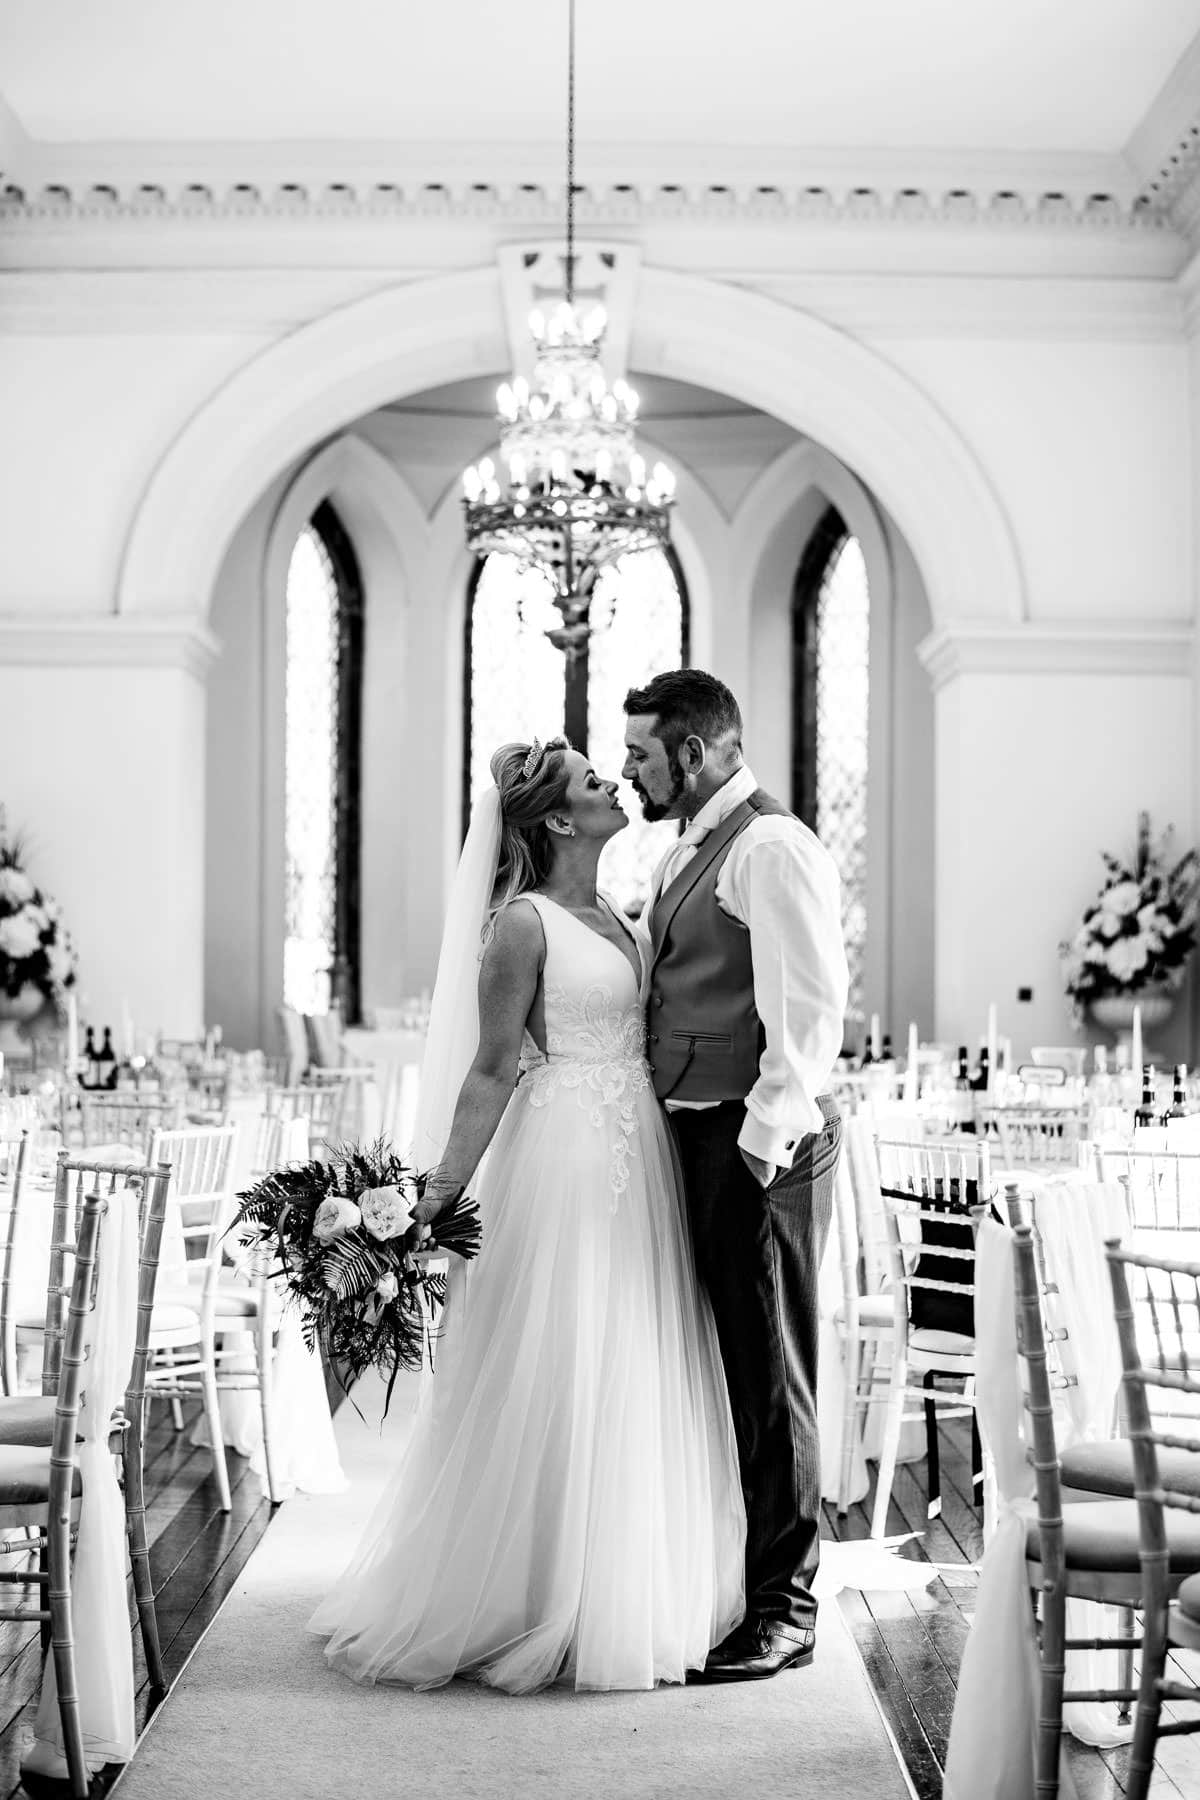 008Clearwell castle wedding photos Jonny Barratt Photography